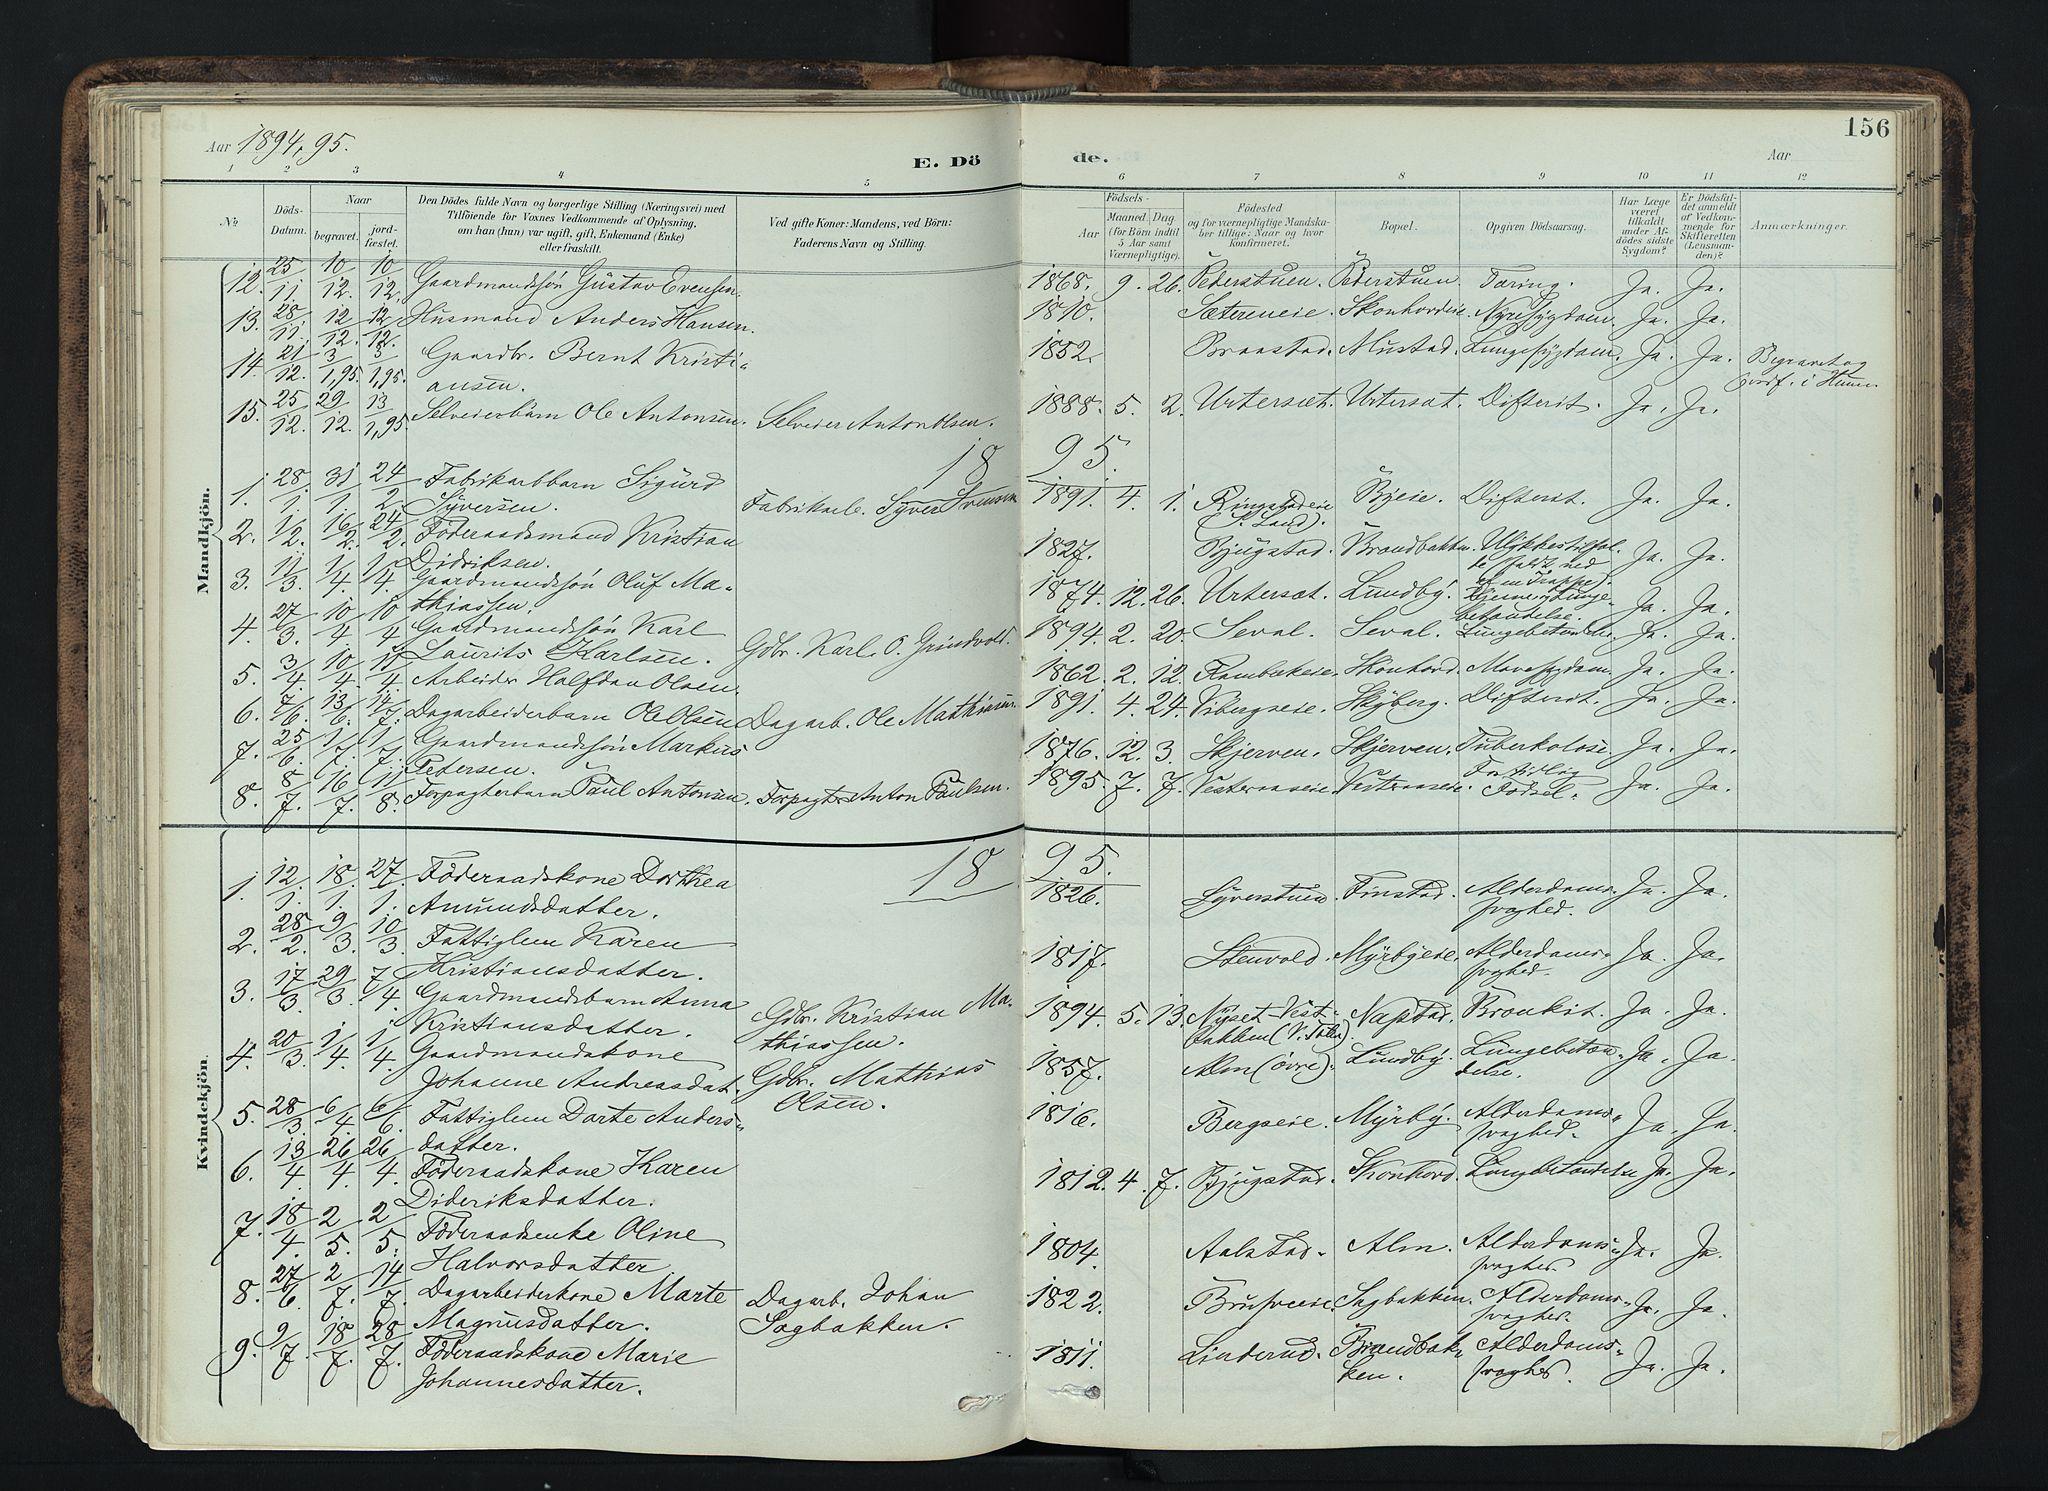 SAH, Vardal prestekontor, H/Ha/Haa/L0019: Ministerialbok nr. 19, 1893-1907, s. 156